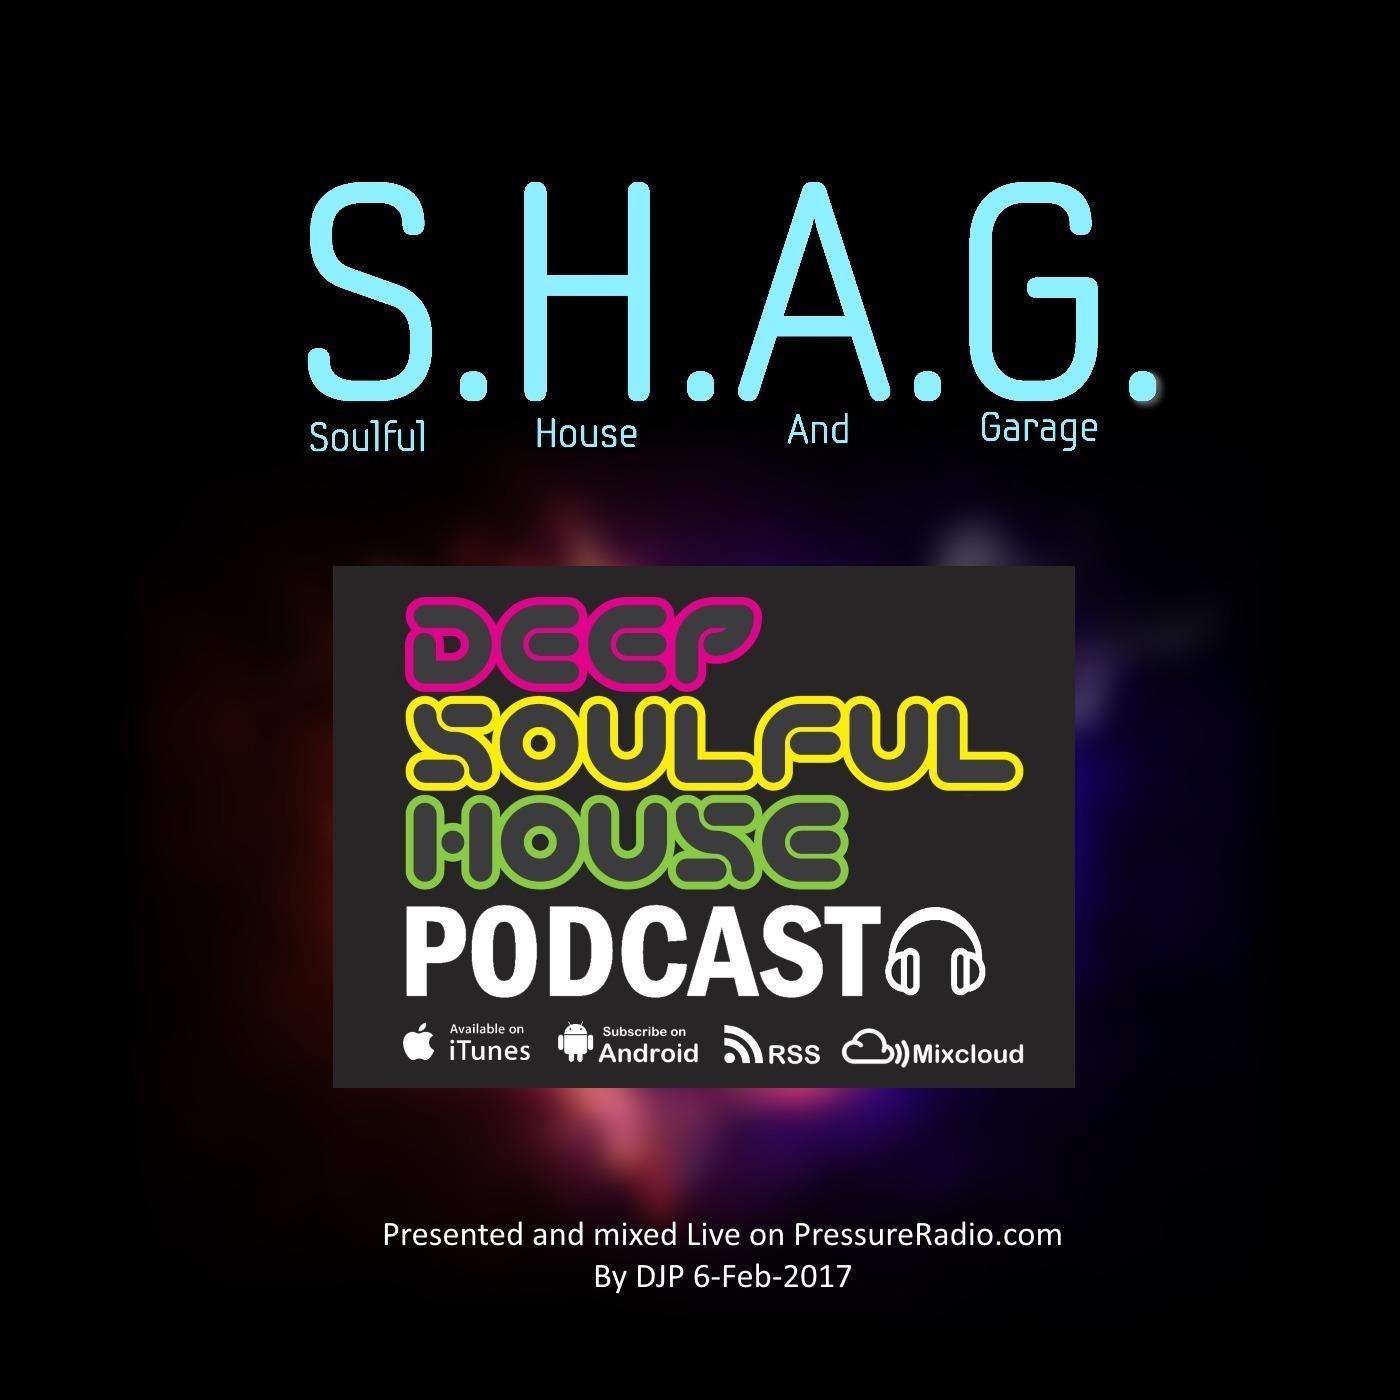 Soulful house and garage djp 6 feb 17 djp 39 s s h a g for 90 s deep house music playlist